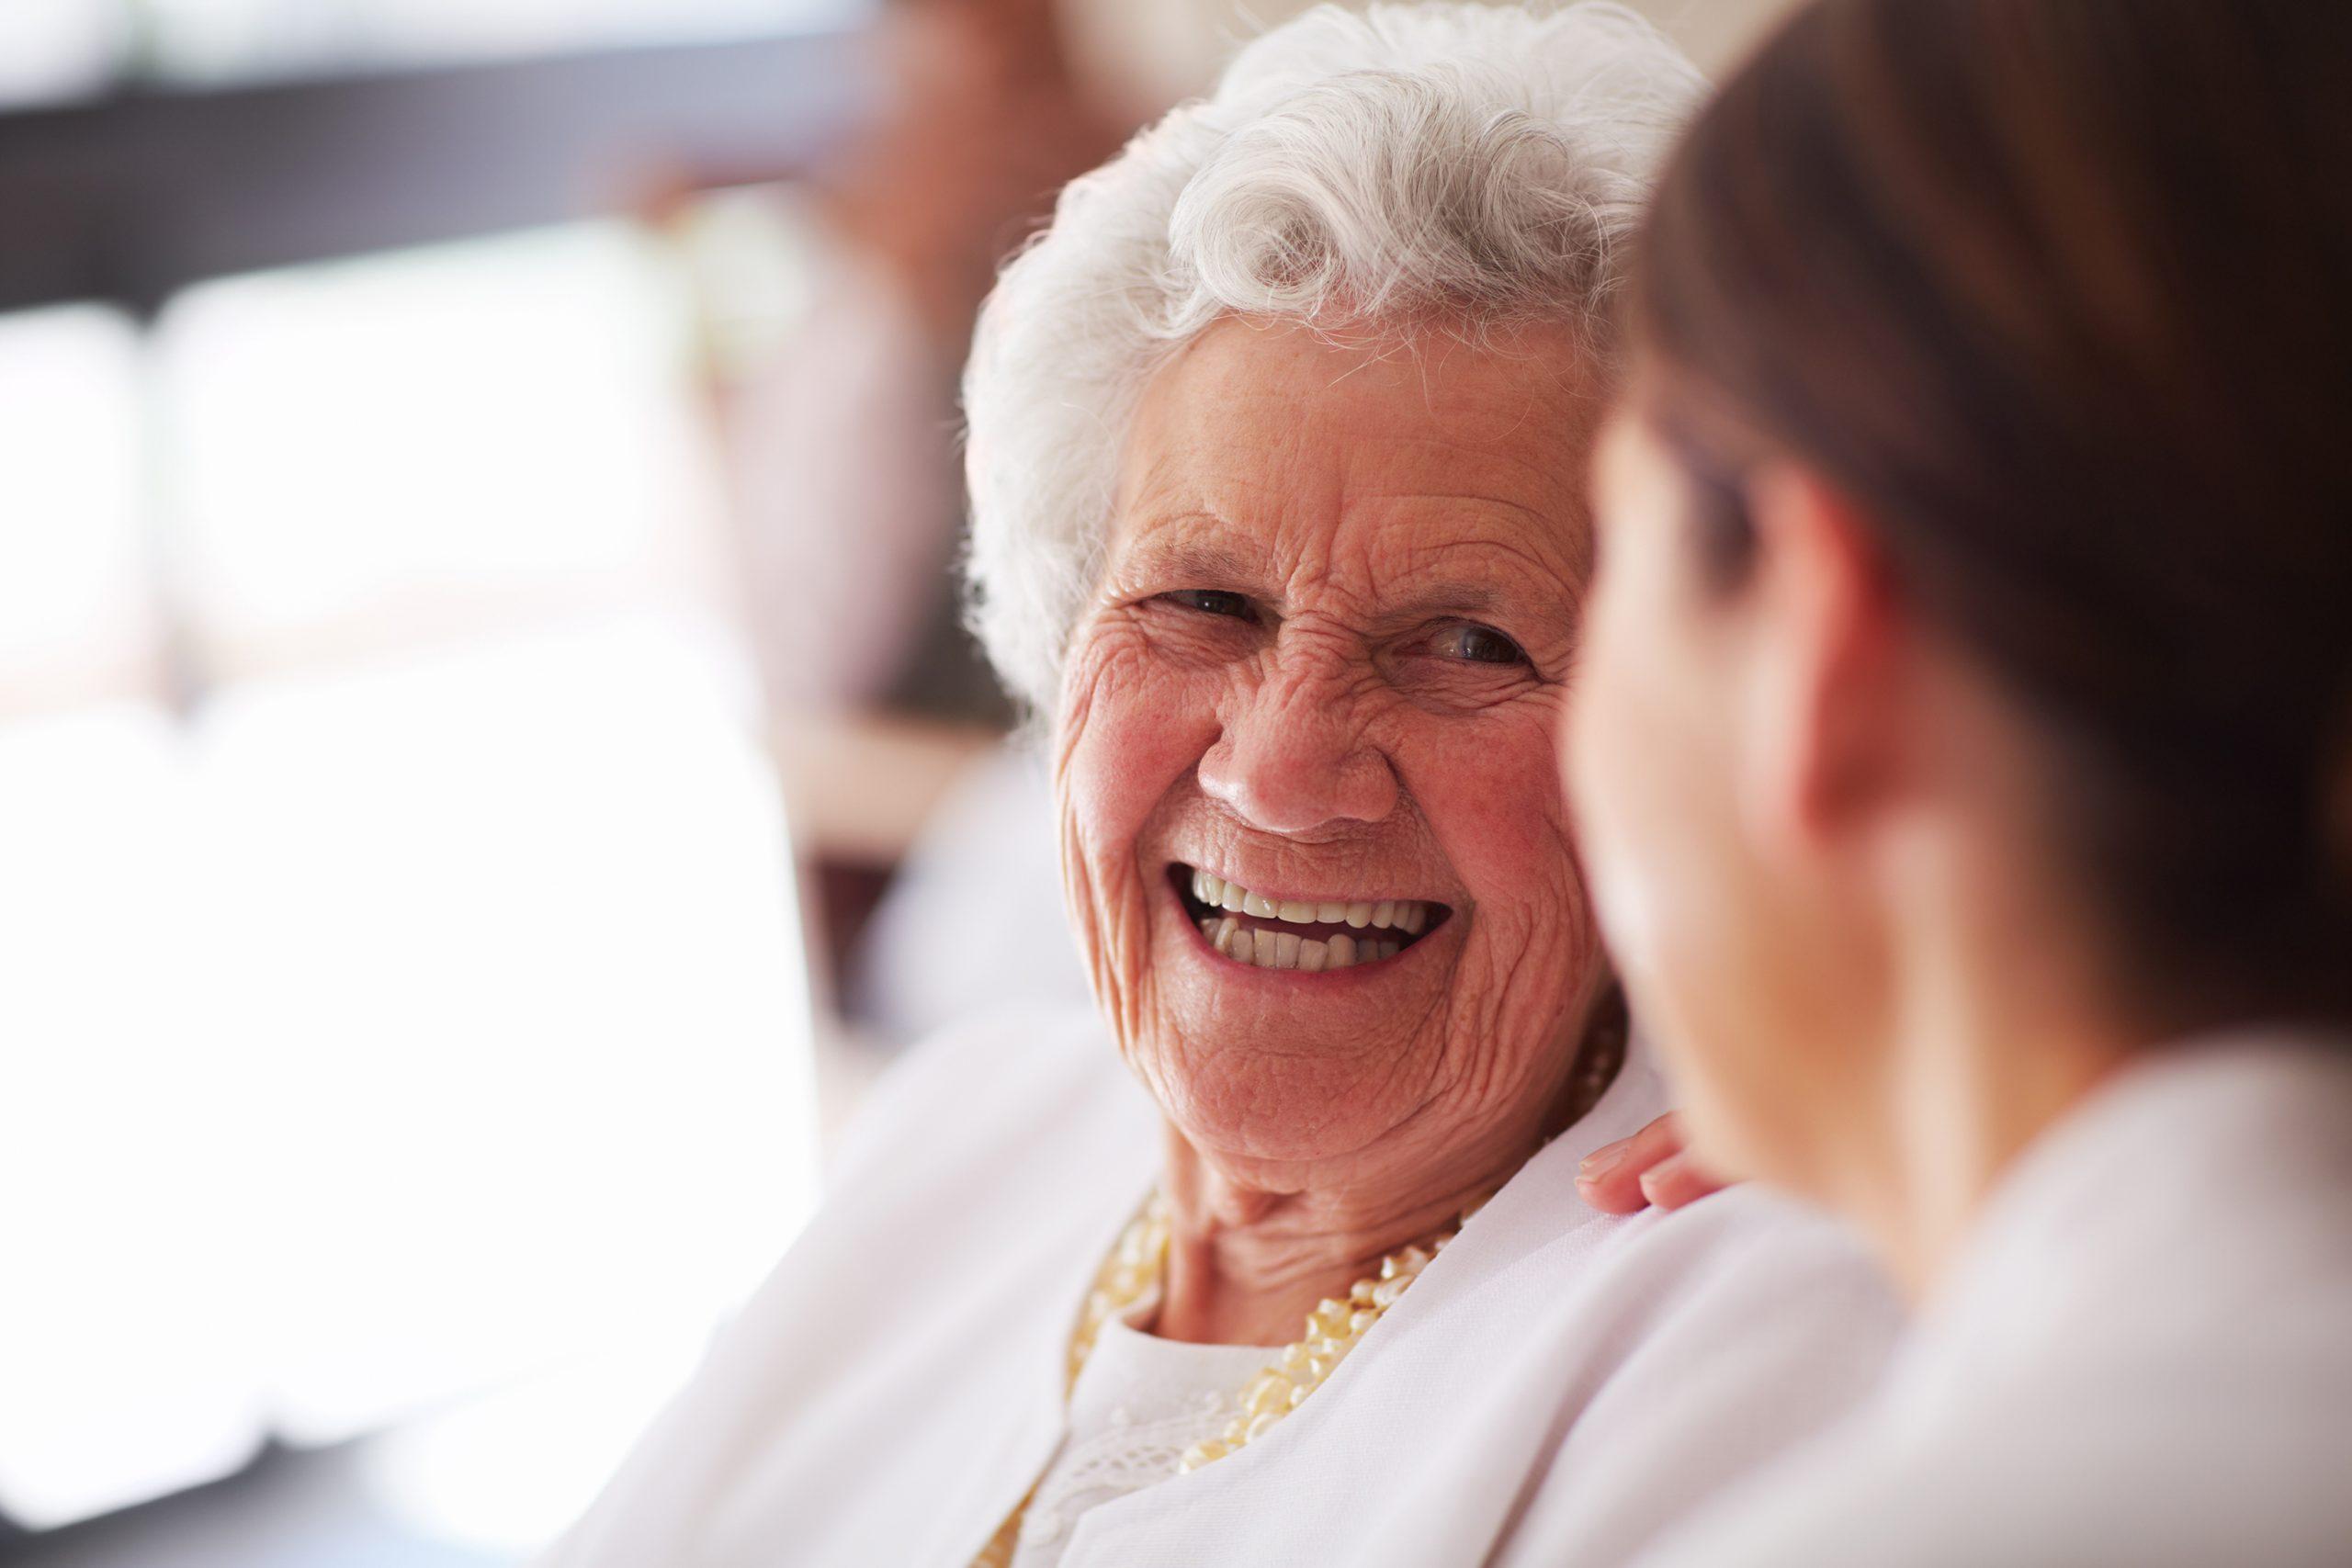 Smiling elderly woman and female nurse